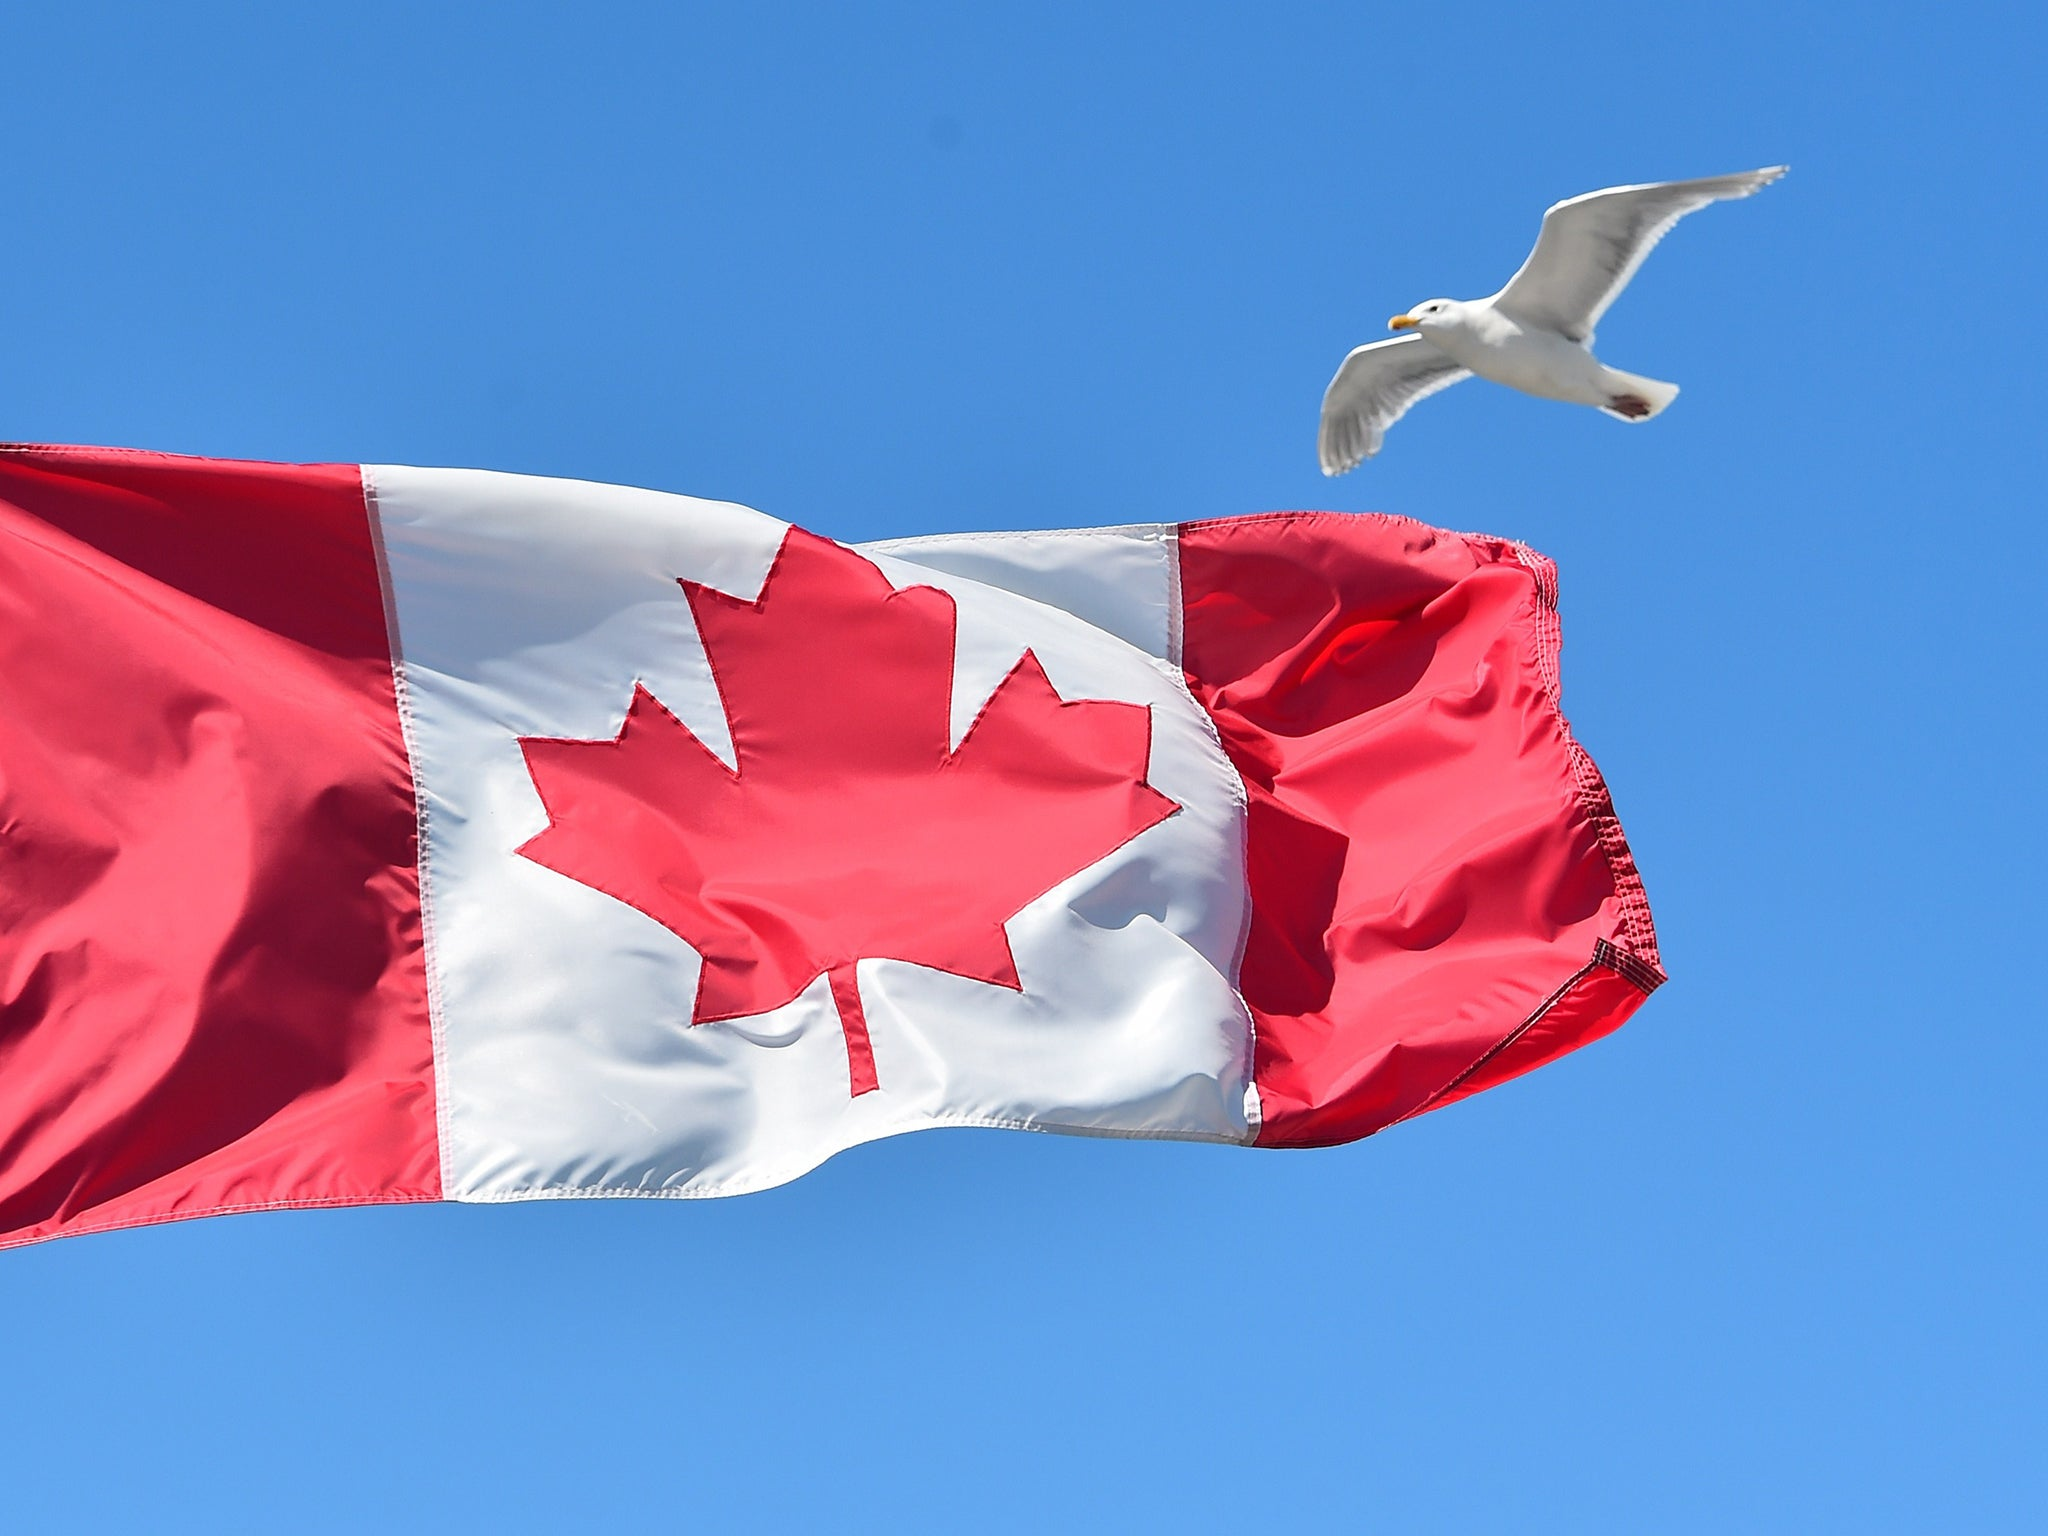 6. Canada, Ireland (Republic of), Korea (Republic of, South), Luxembourg, Norway, Portugal, Switzerland